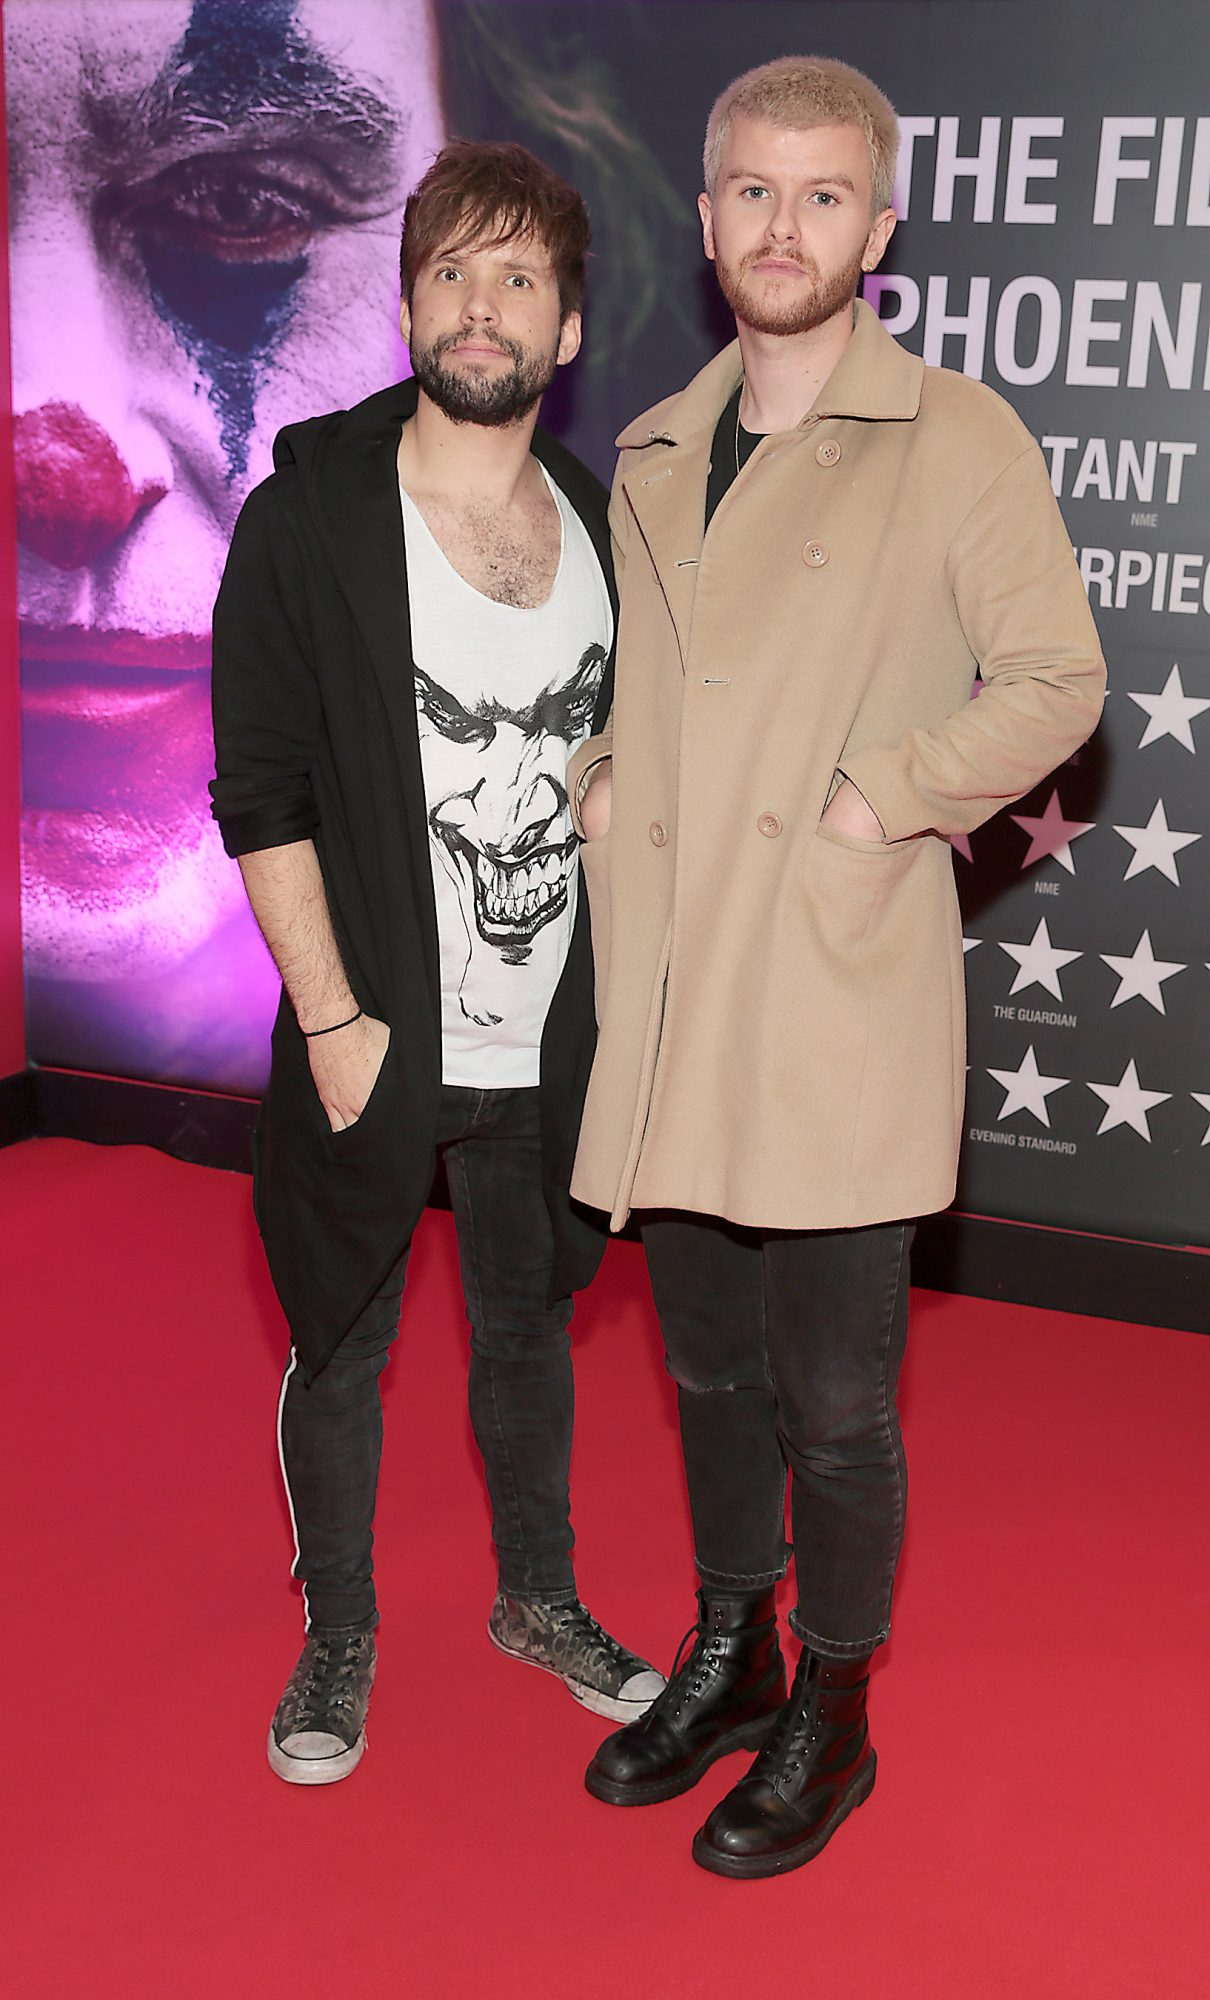 Calum McAdam and David Whelan of Wild Youth at the Irish Premiere screening of Joker at Cineworld, Dublin. Pic: Brian McEvoy.